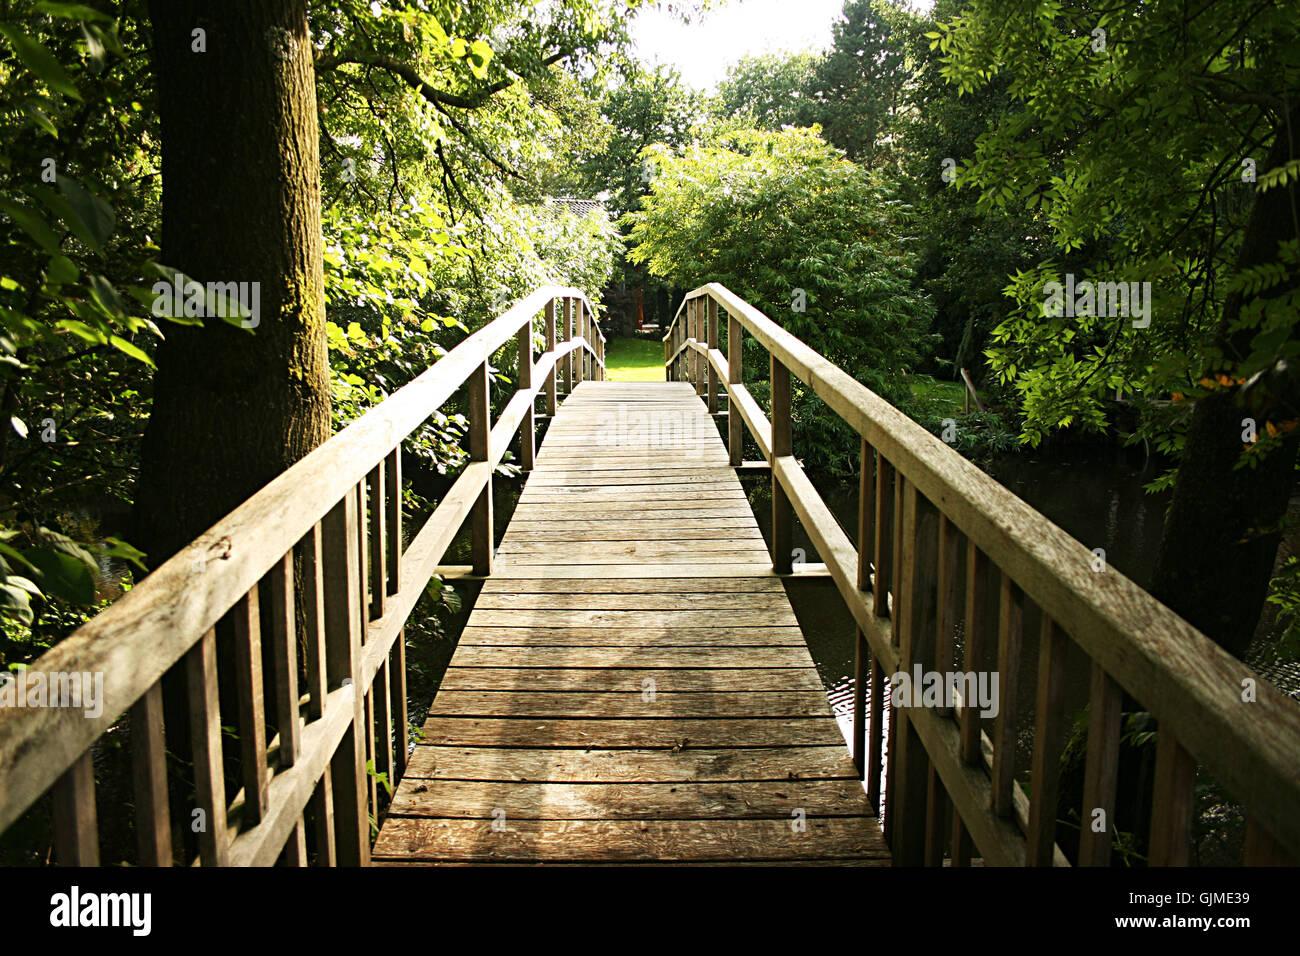 bridge over the creek - Stock Image